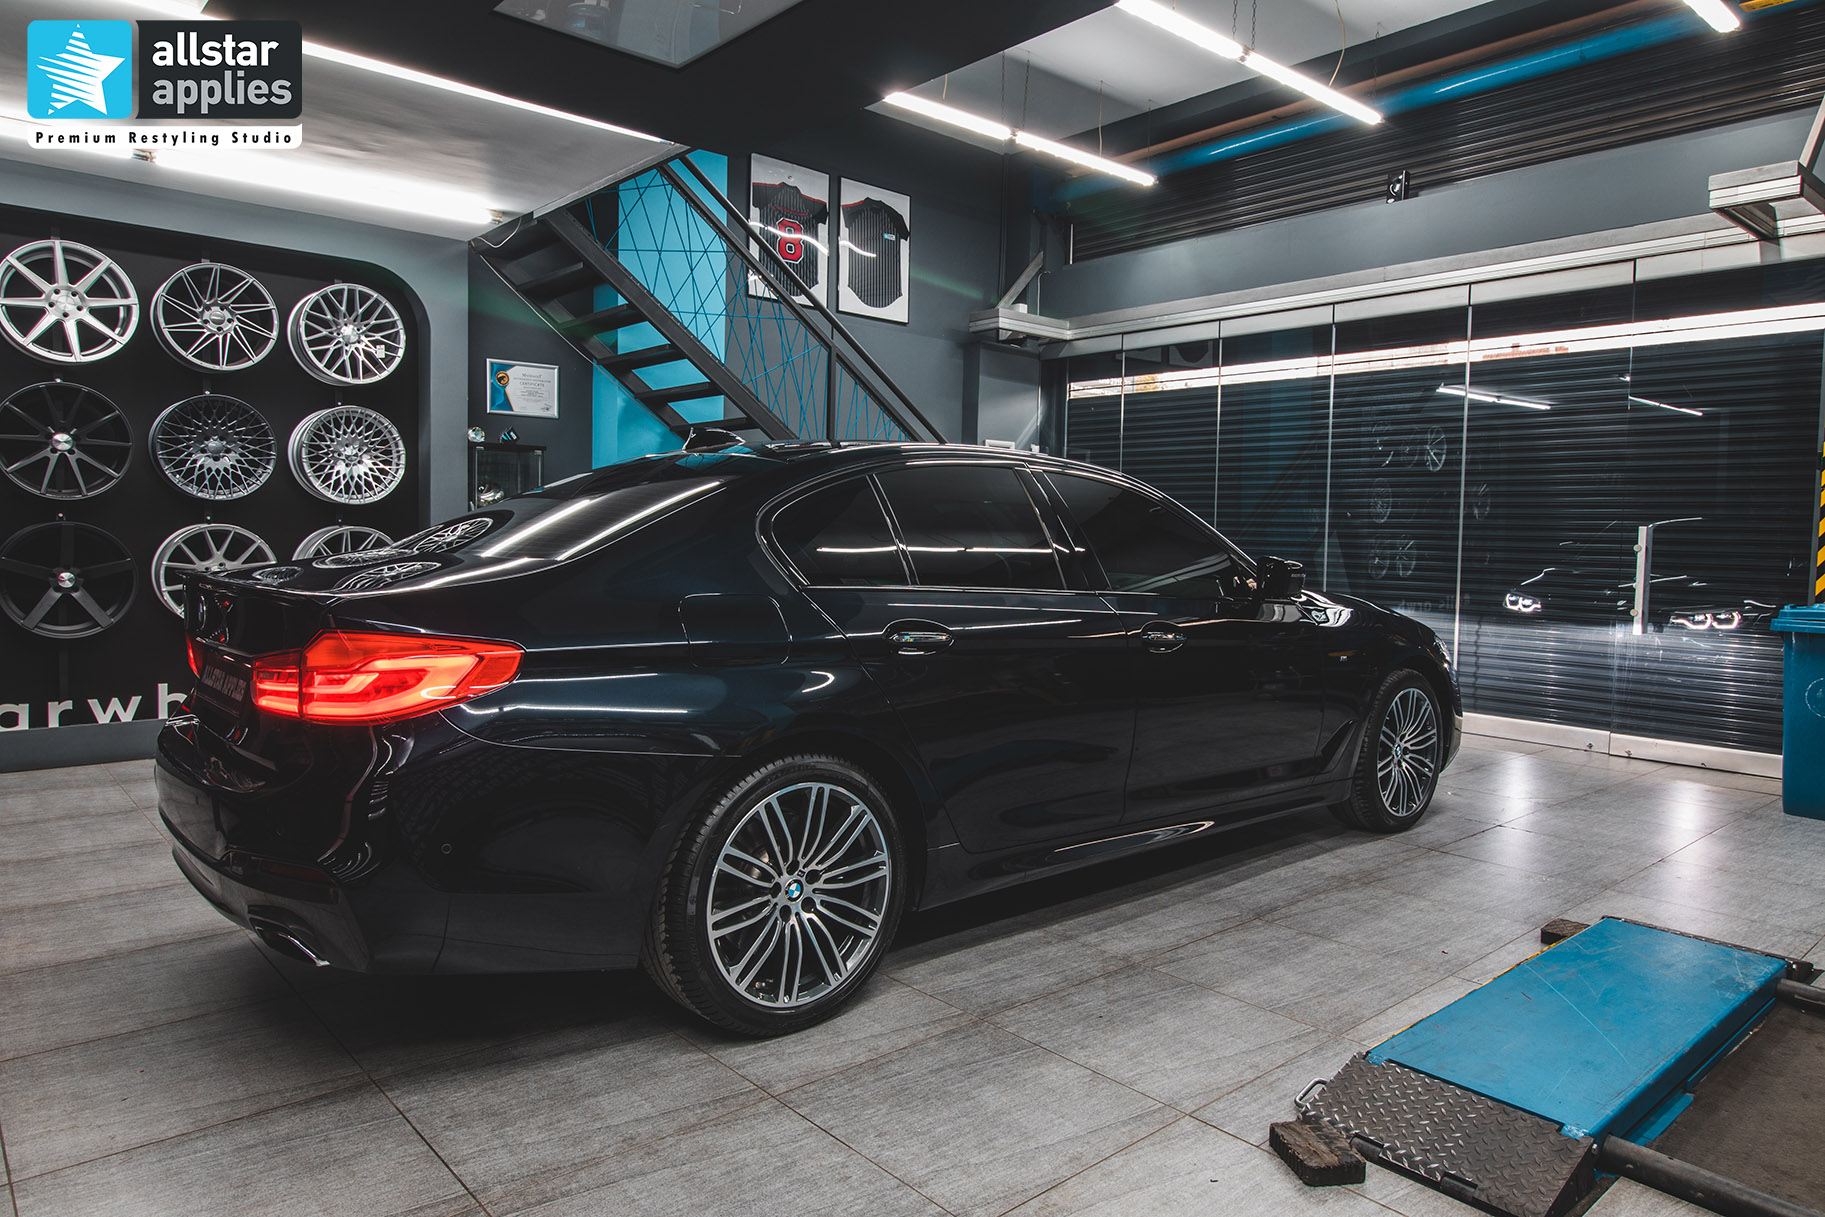 BMW G30 5 SERIES M ALLSTAR APPLIES PPF 3